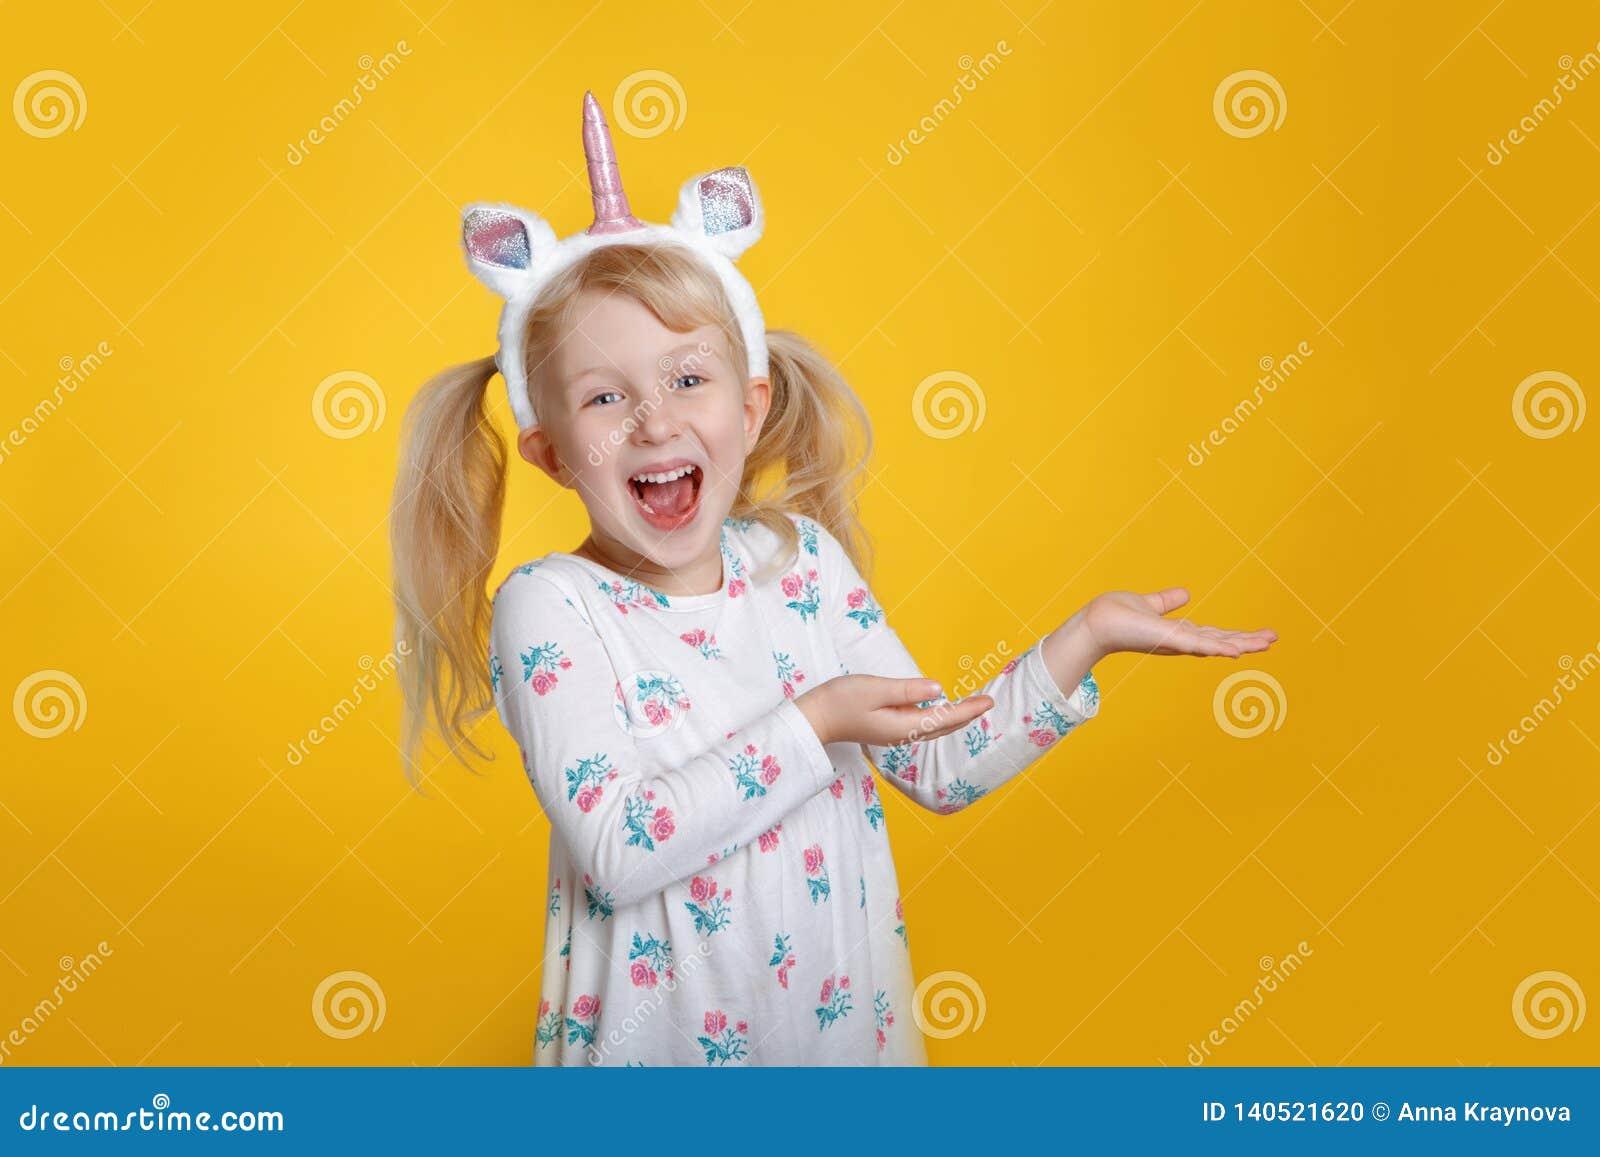 Caucasian blonde girl in white dress wearing unicorn headband horn and ears